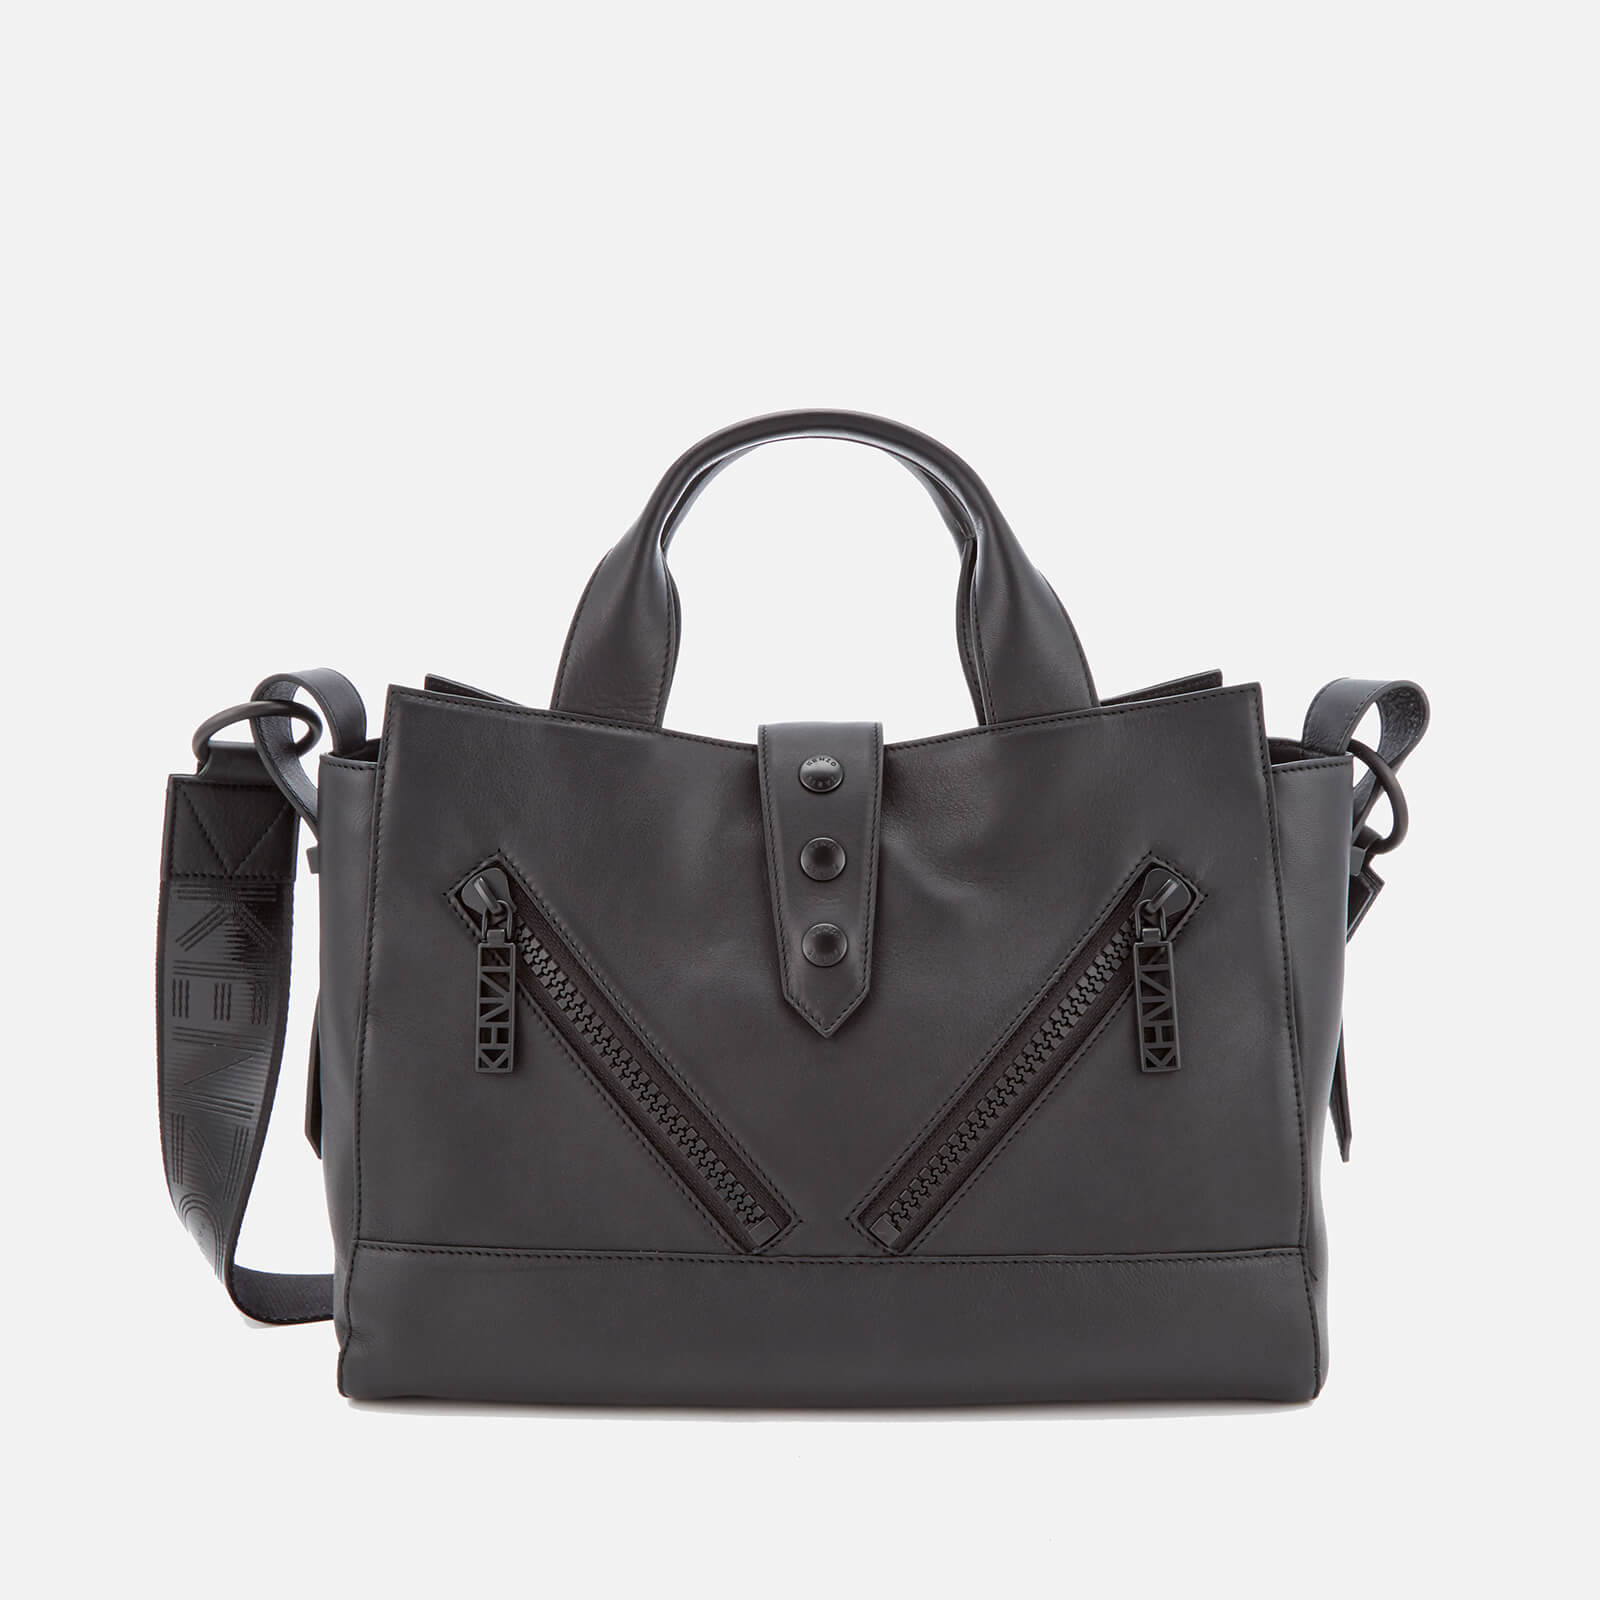 fe18b376 KENZO Women's Sport Medium Kalifornia Tote Bag - Black - Free UK Delivery  over £50